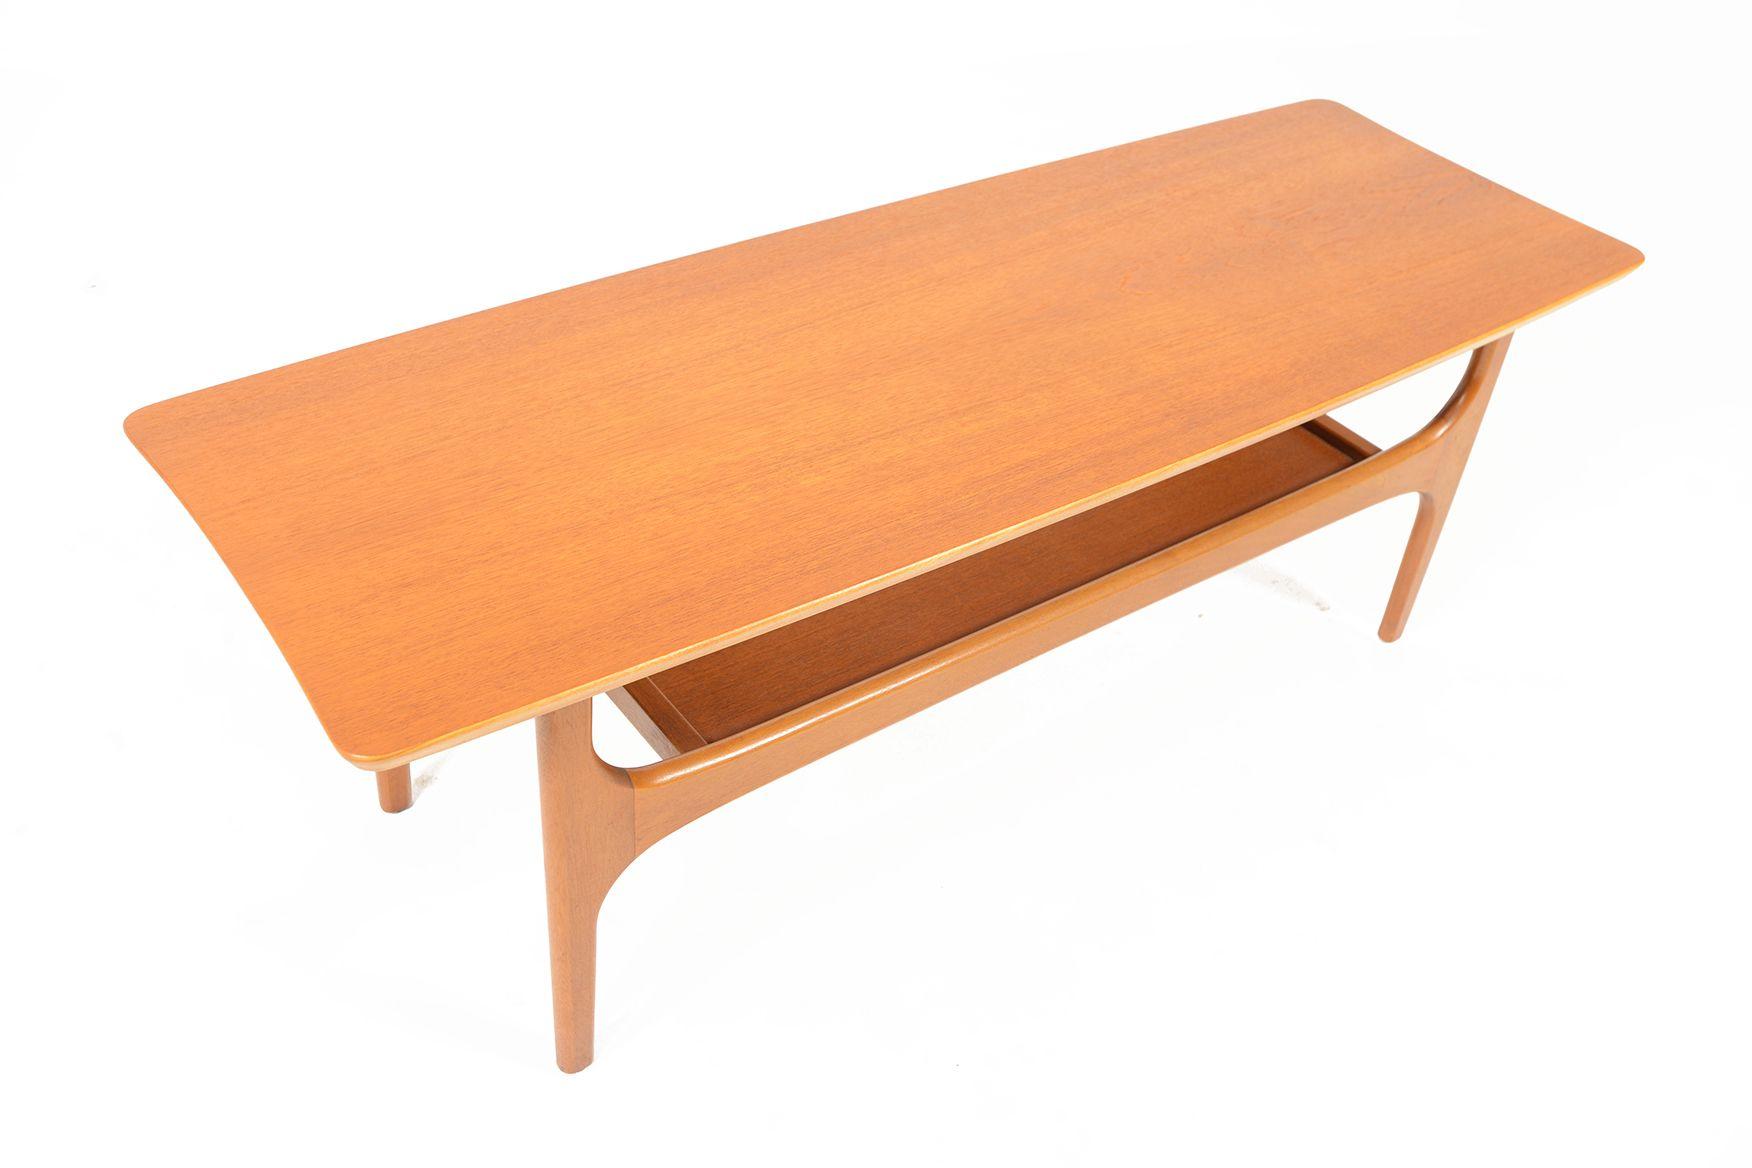 Teak Stingray Coffee Table By Jentique Mid Century Mobler Mid Century Modern Teak Coffee Table [ 1168 x 1752 Pixel ]